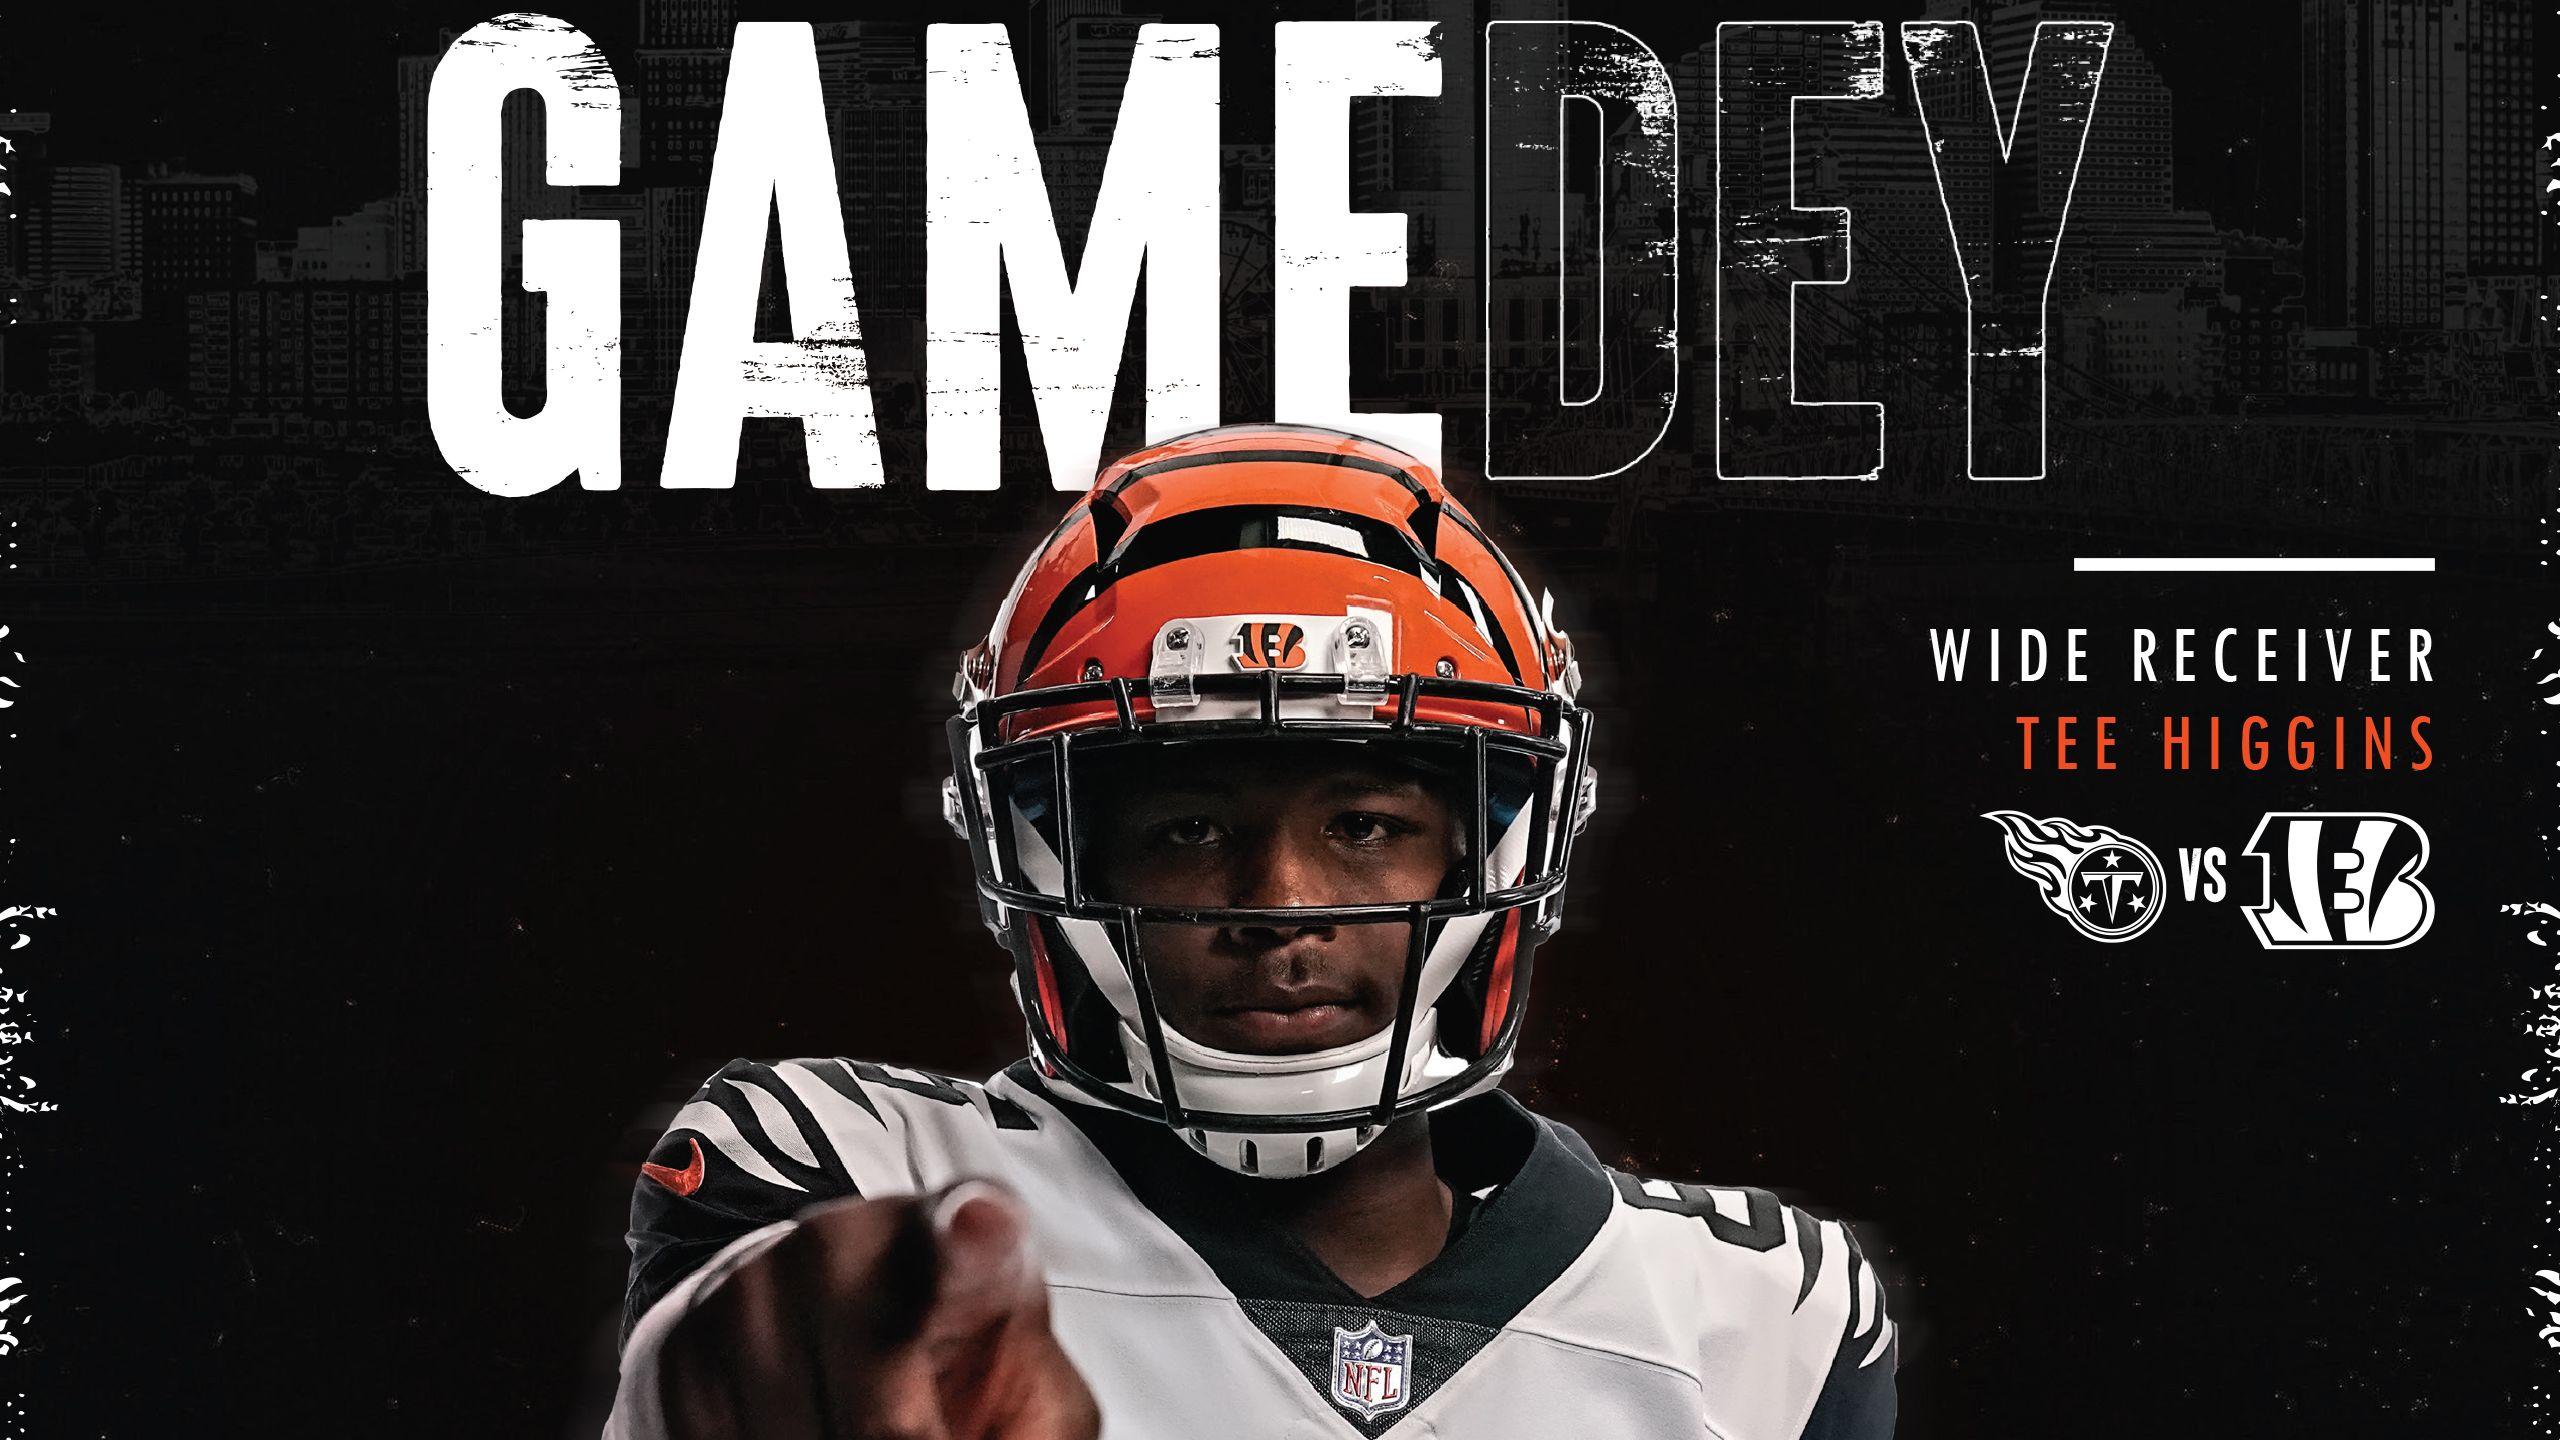 Gamedey Program - Game 4 vs. Tennessee Titans